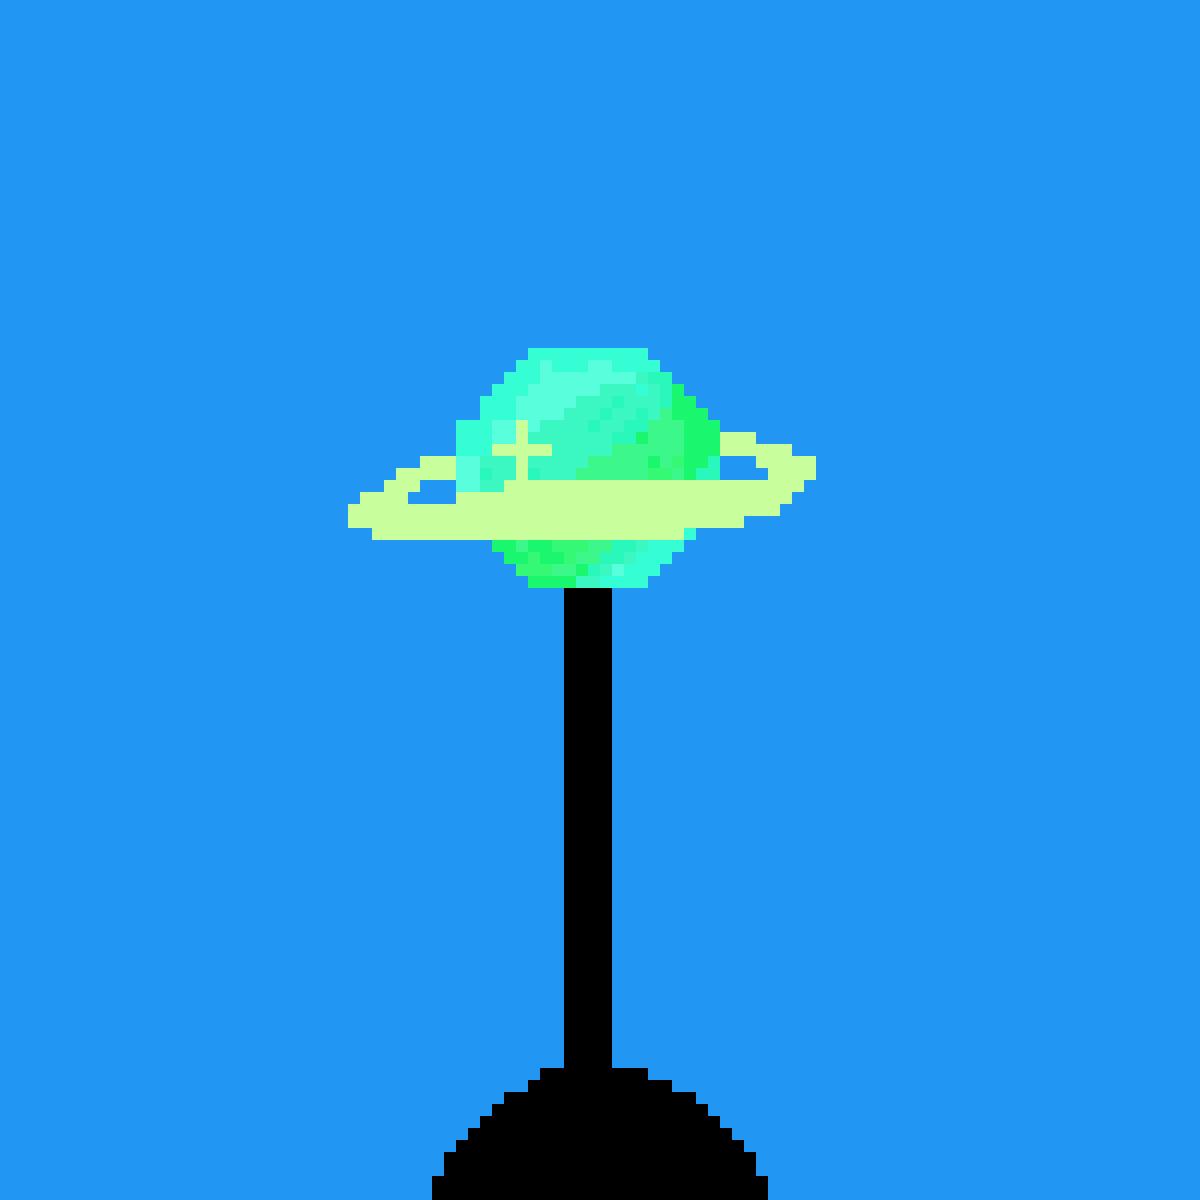 Plant lamp by Jrayke